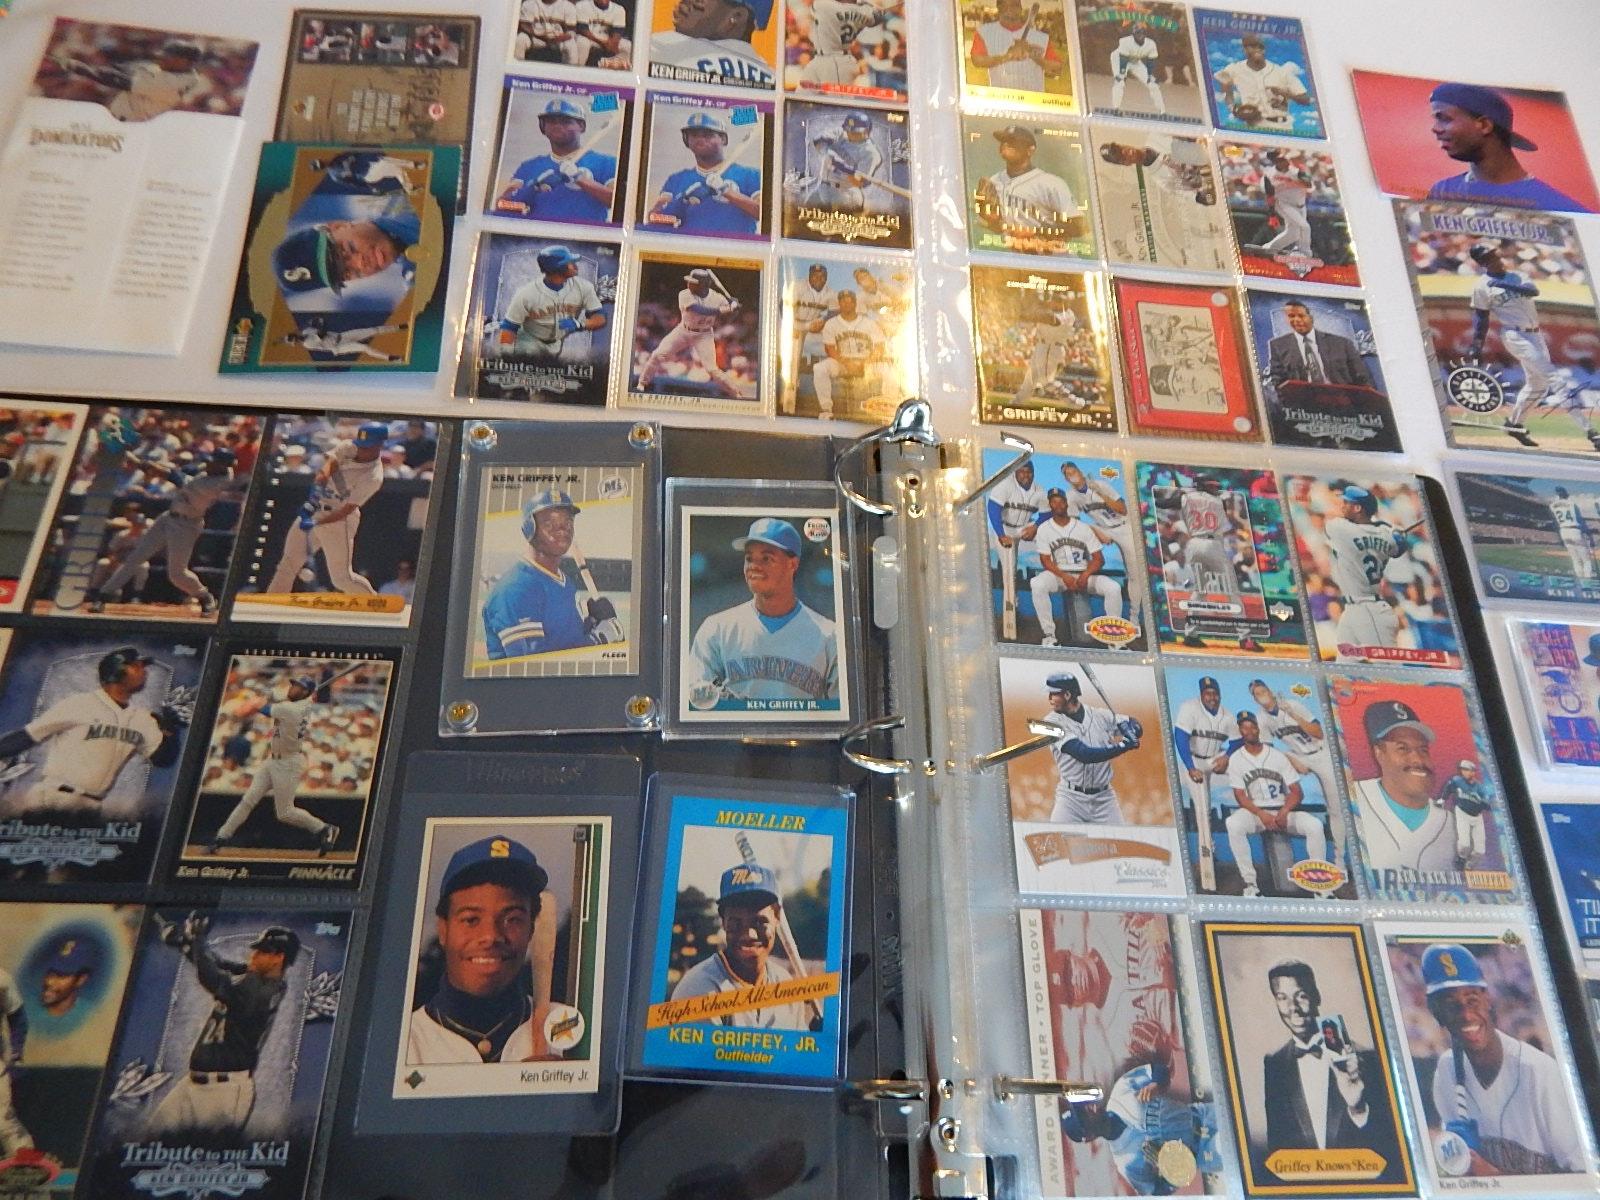 HOF Ken Griffey Jr. Card Collection in Album with 1989 Upper Deck Rookie Card